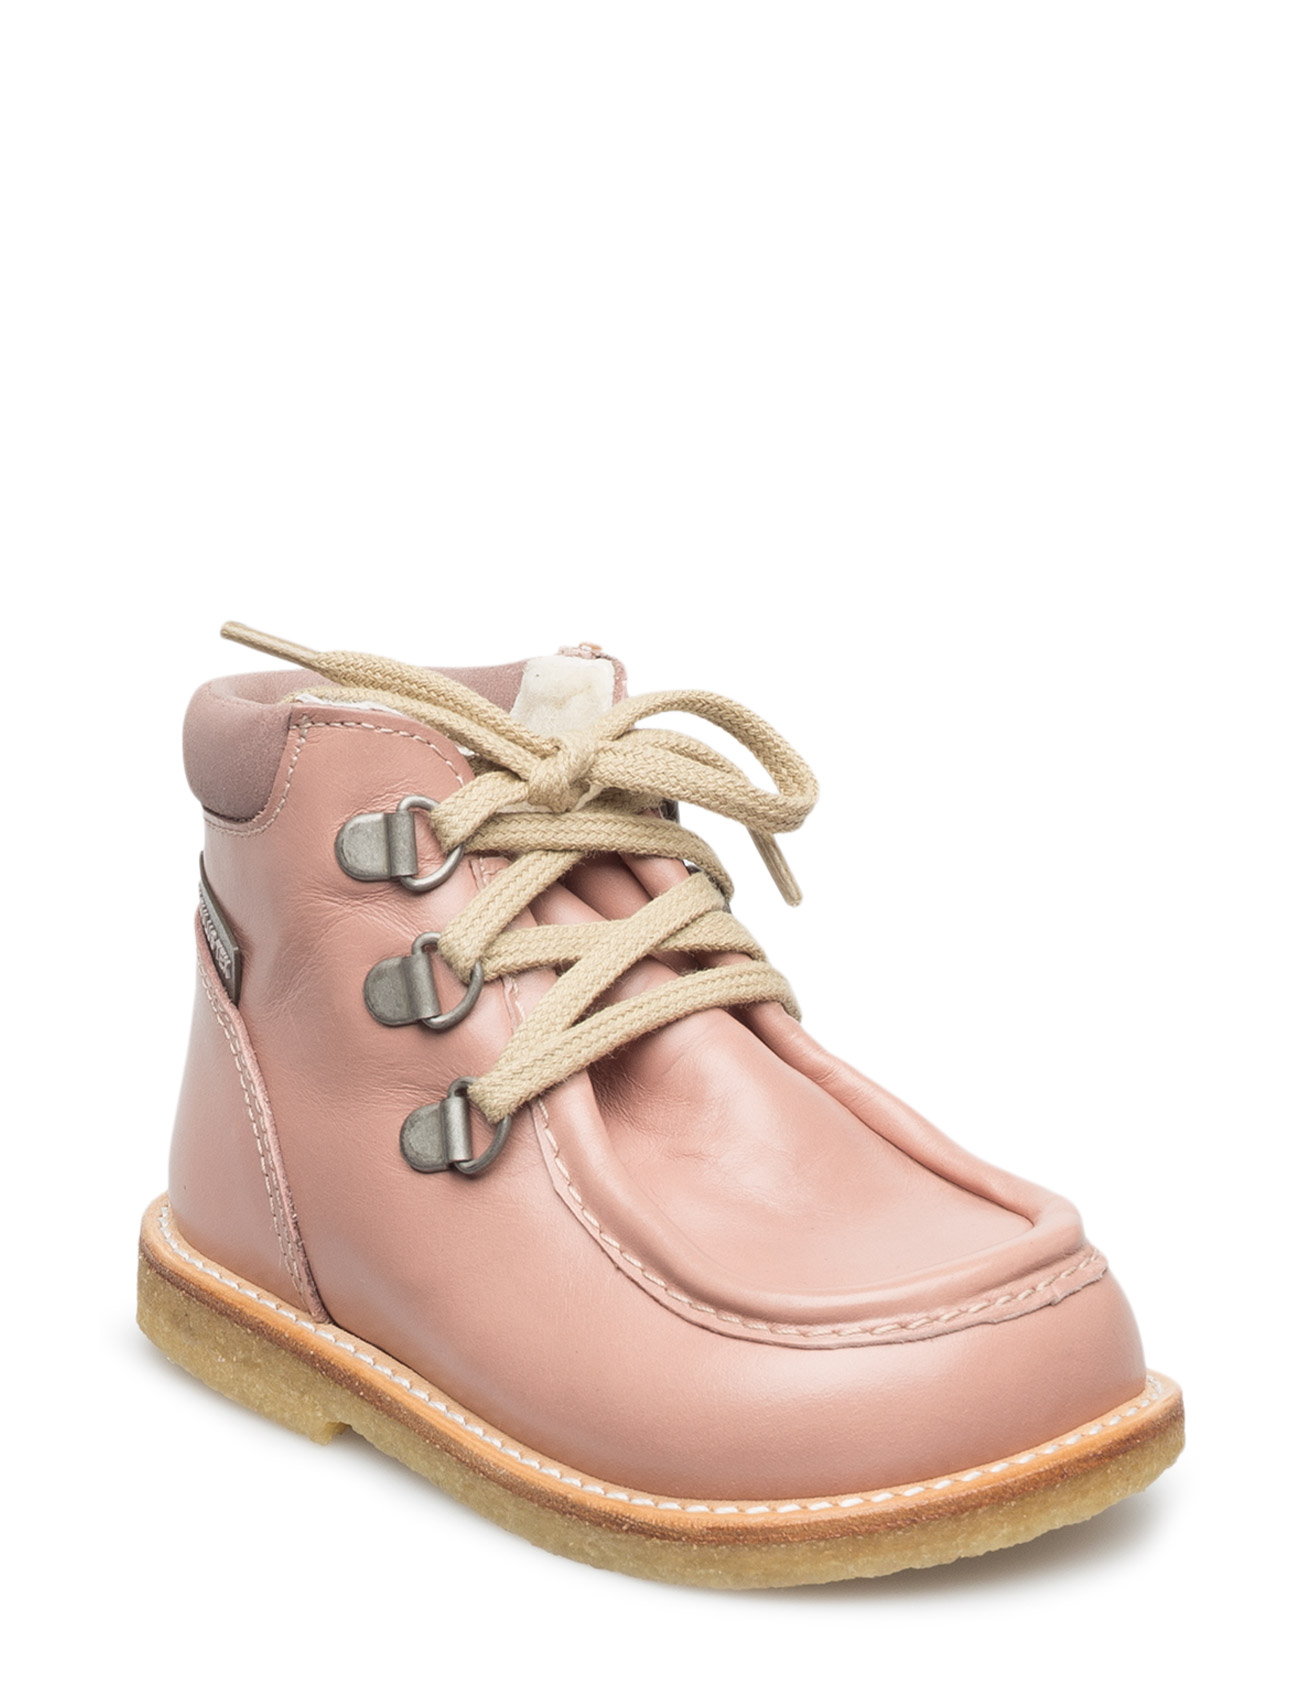 2026 ANGULUS Støvler til Børn i